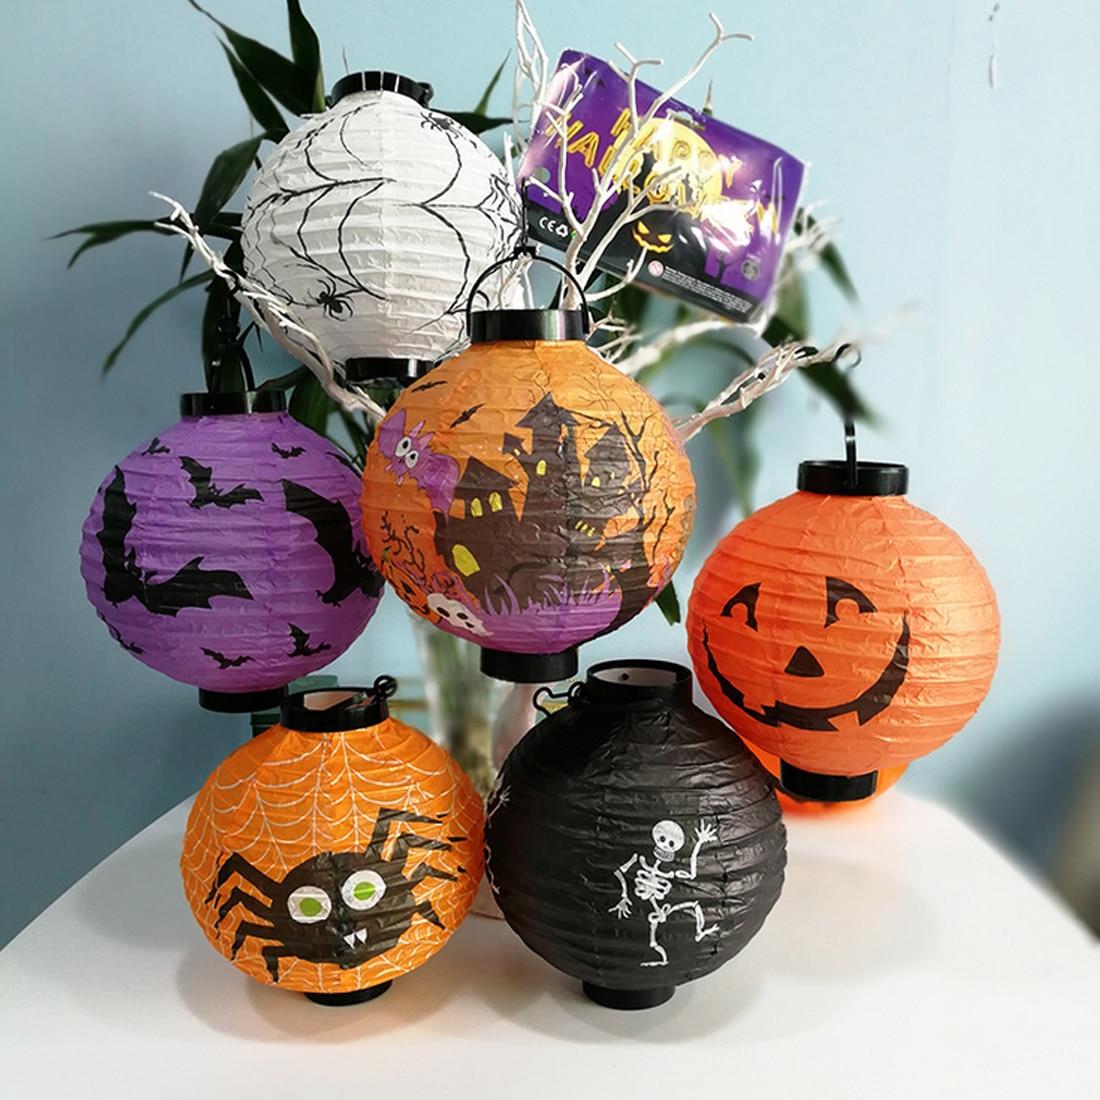 Halloween Decoration LED Paper Pumpkin Hanging Lantern Spider Light Lamp Party Decoration for Home Horror Lantern Supplies